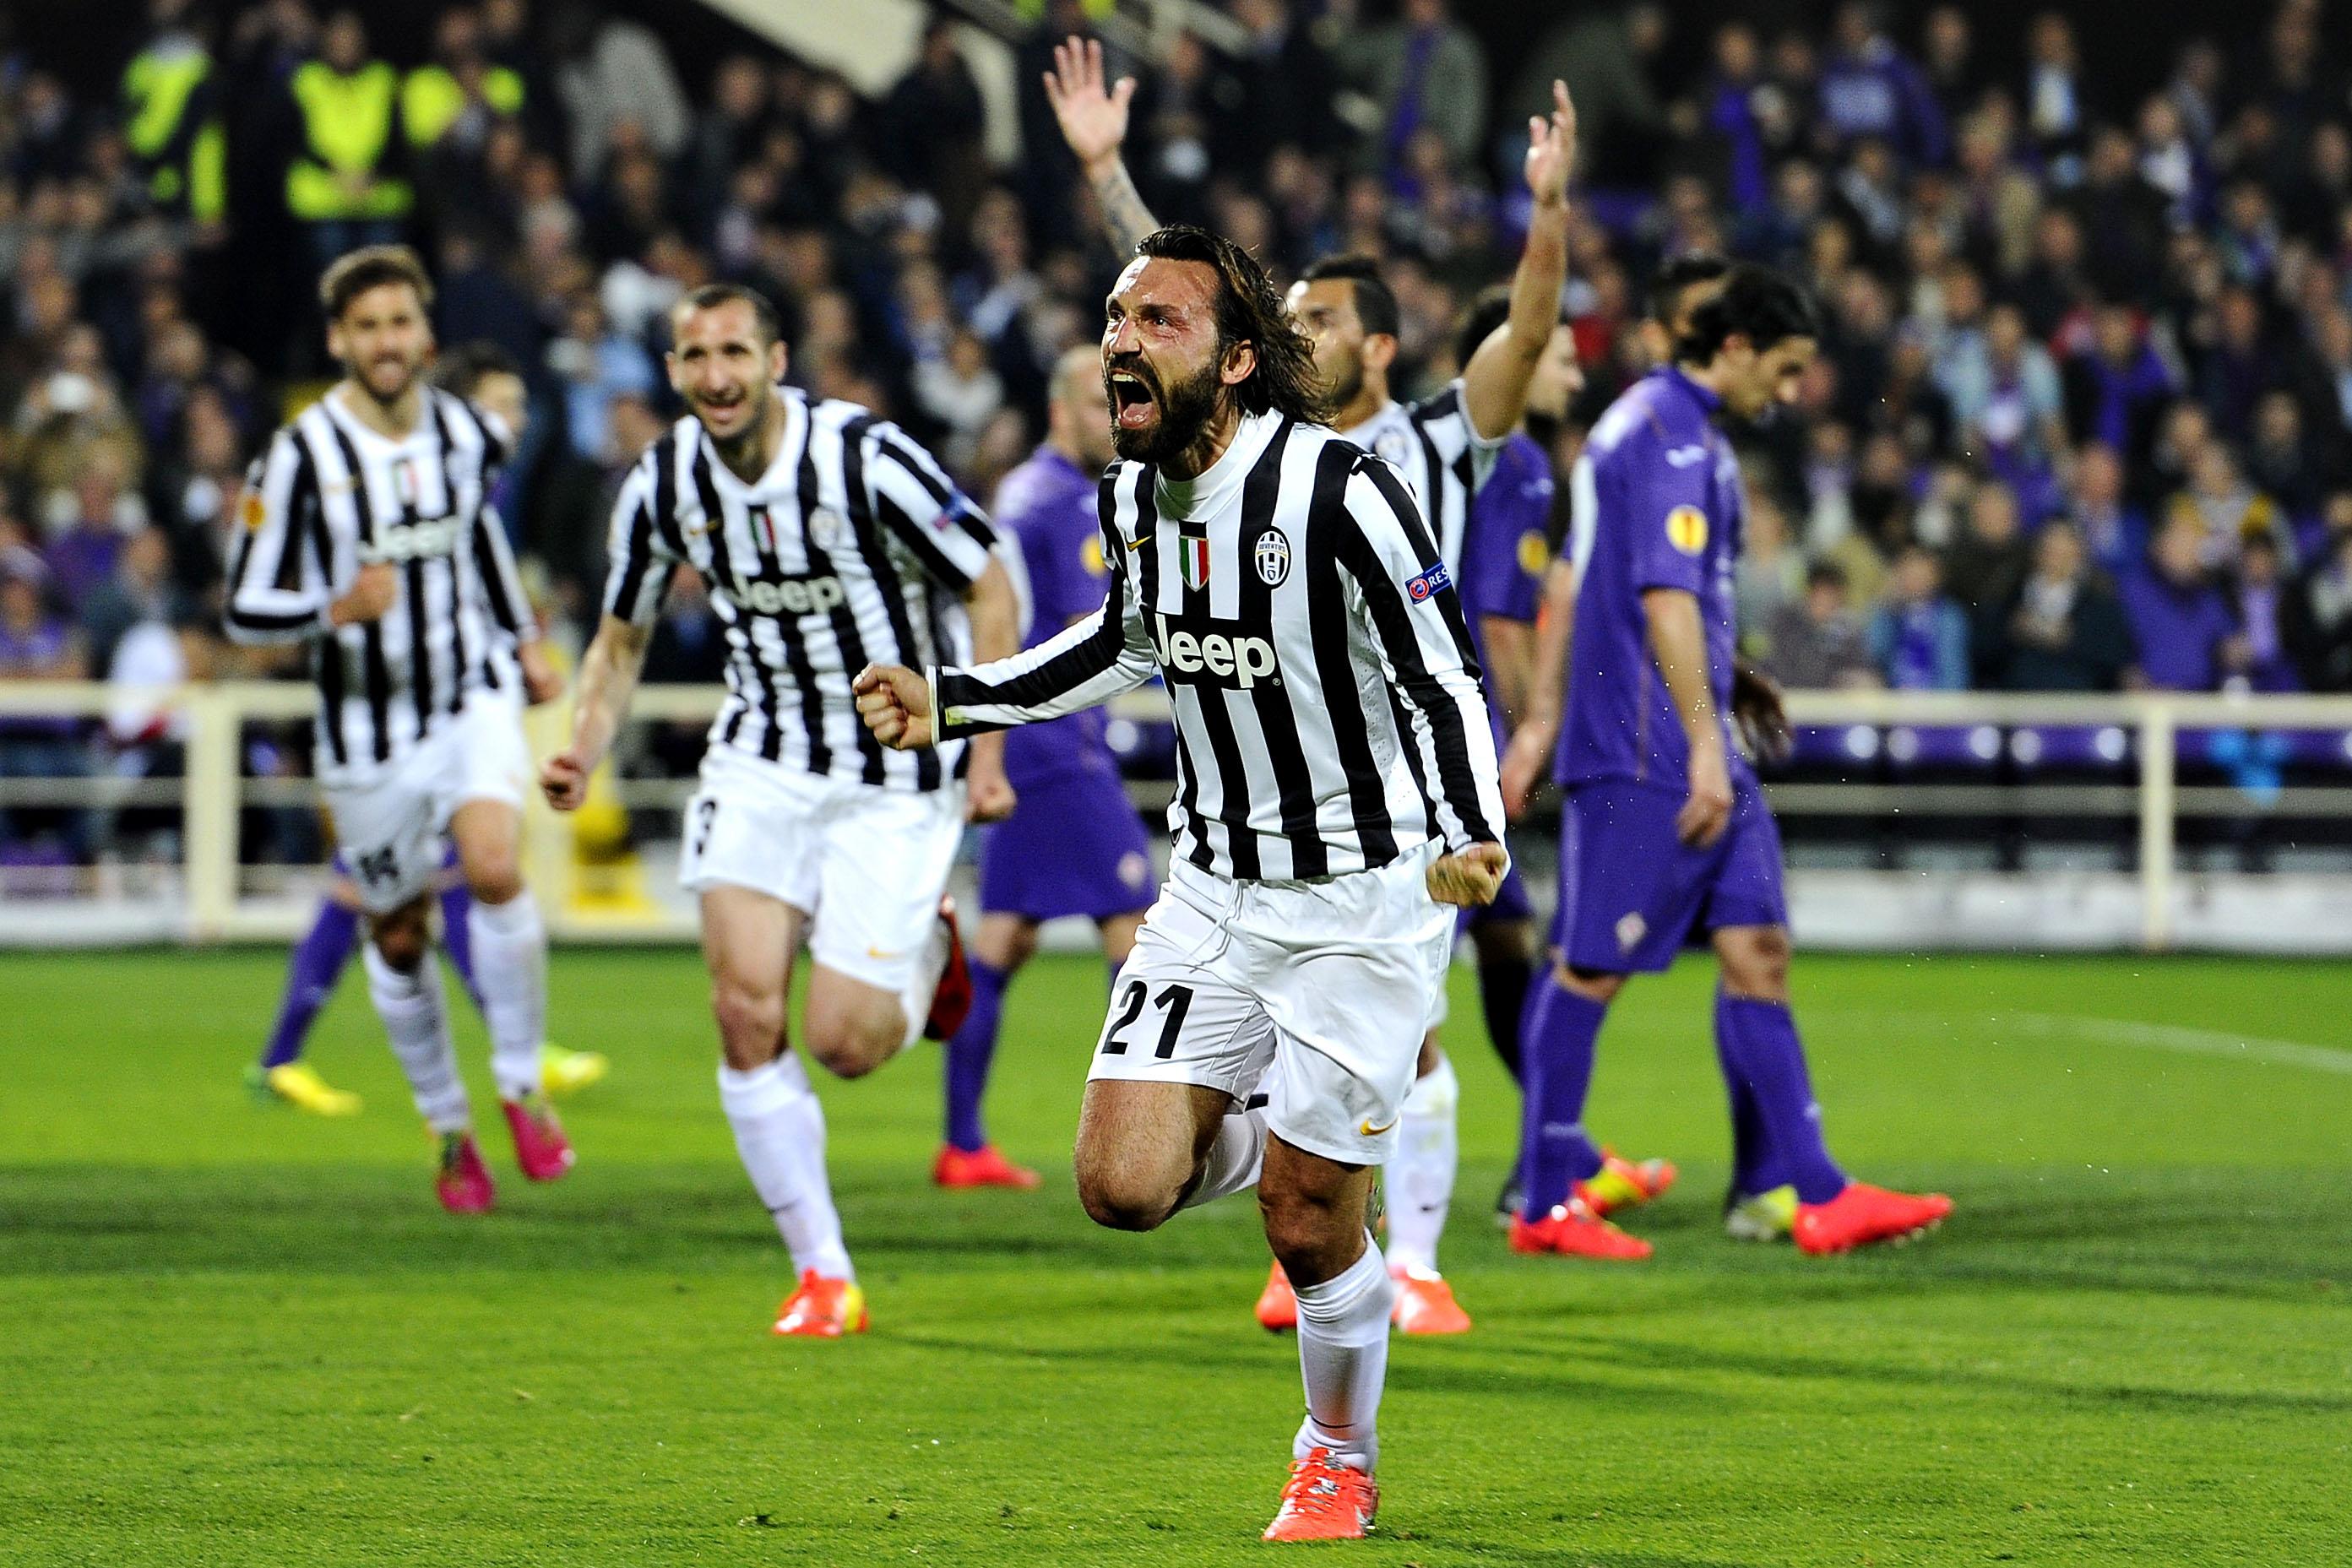 Fiorentina-Juventus Europa League